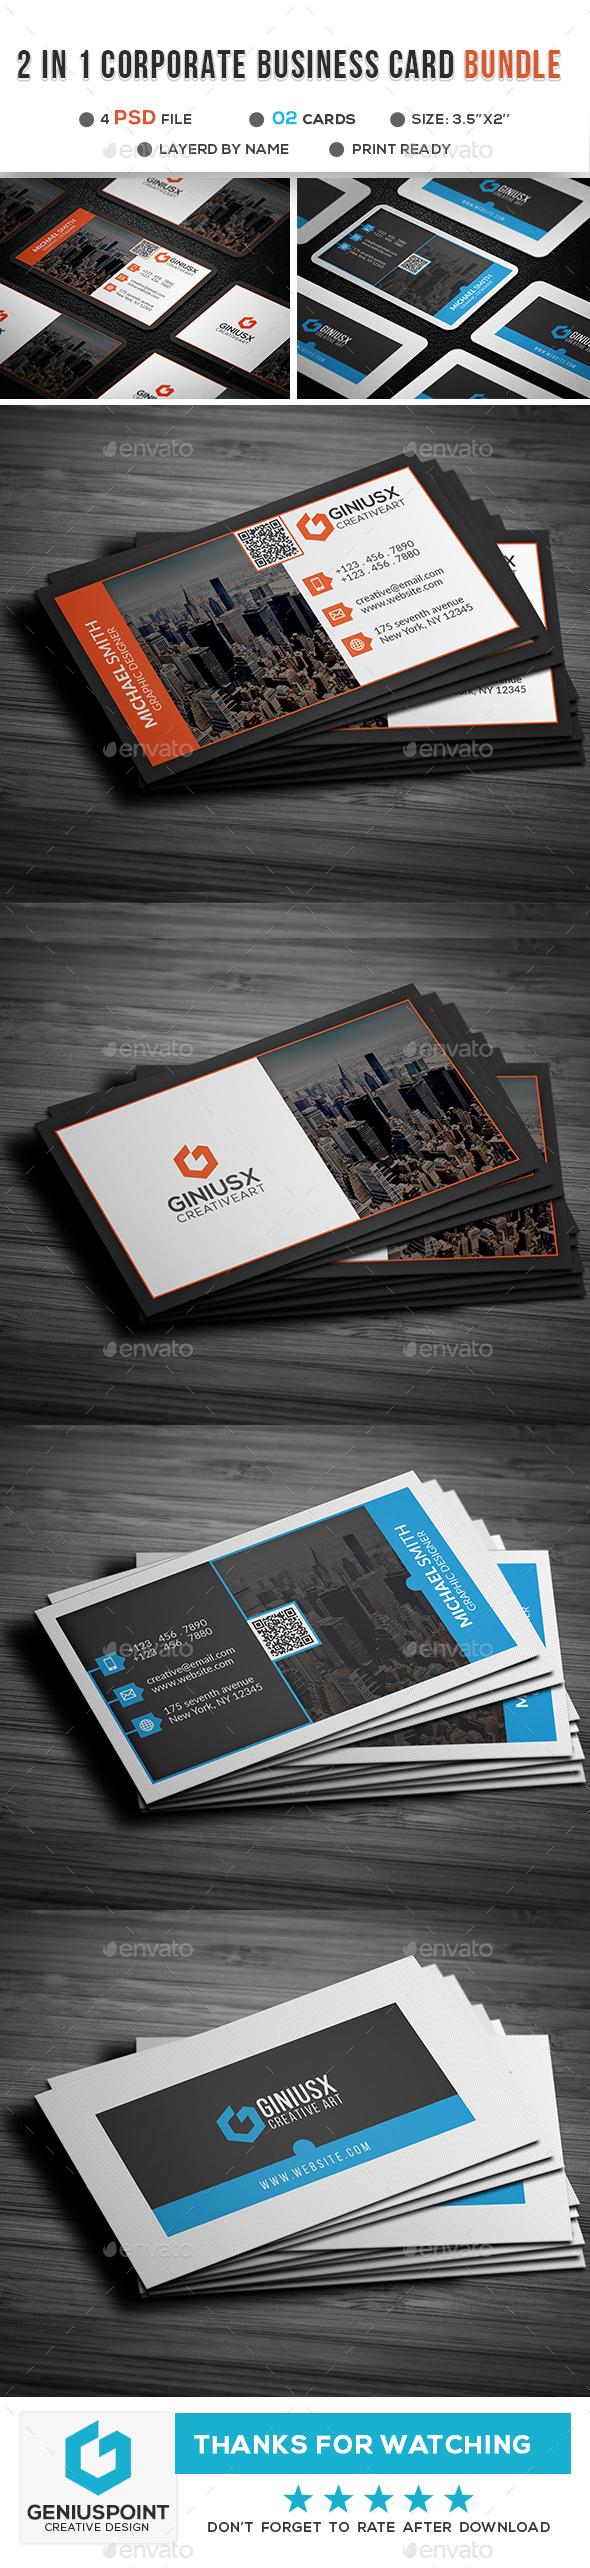 2 in 1 Corporate Business Card Bundle - Corporate Business Cards